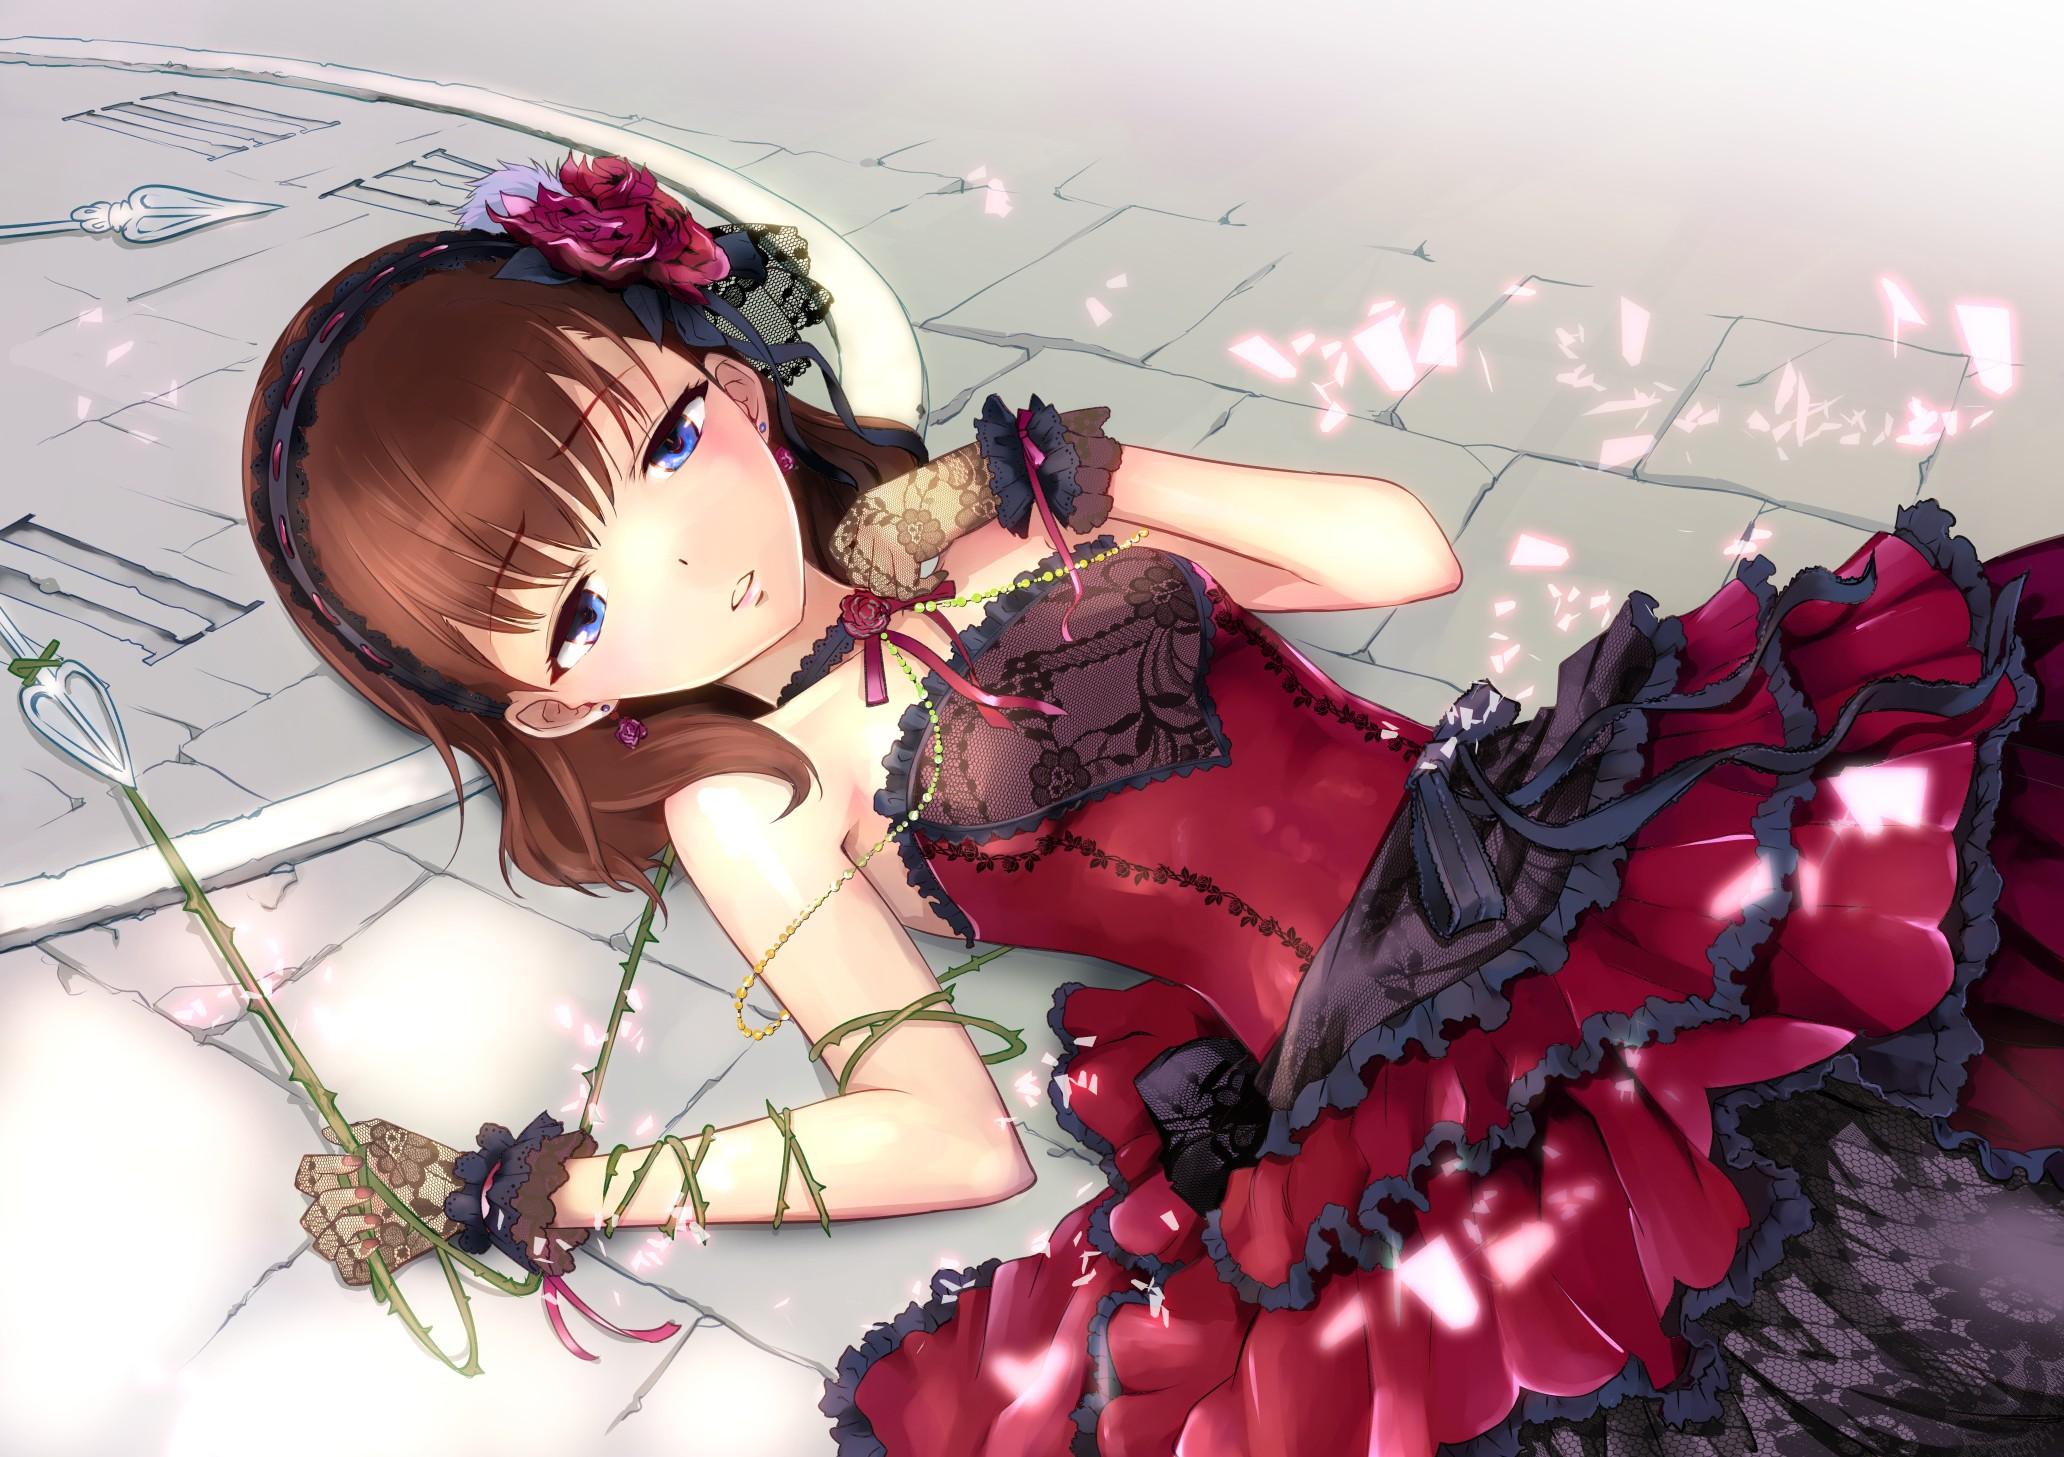 Anime 2064x1457 anime anime girls dress long hair brunette blue eyes THE iDOLM@STER: Cinderella Girls Kazumiya Akira Sakuma Mayu